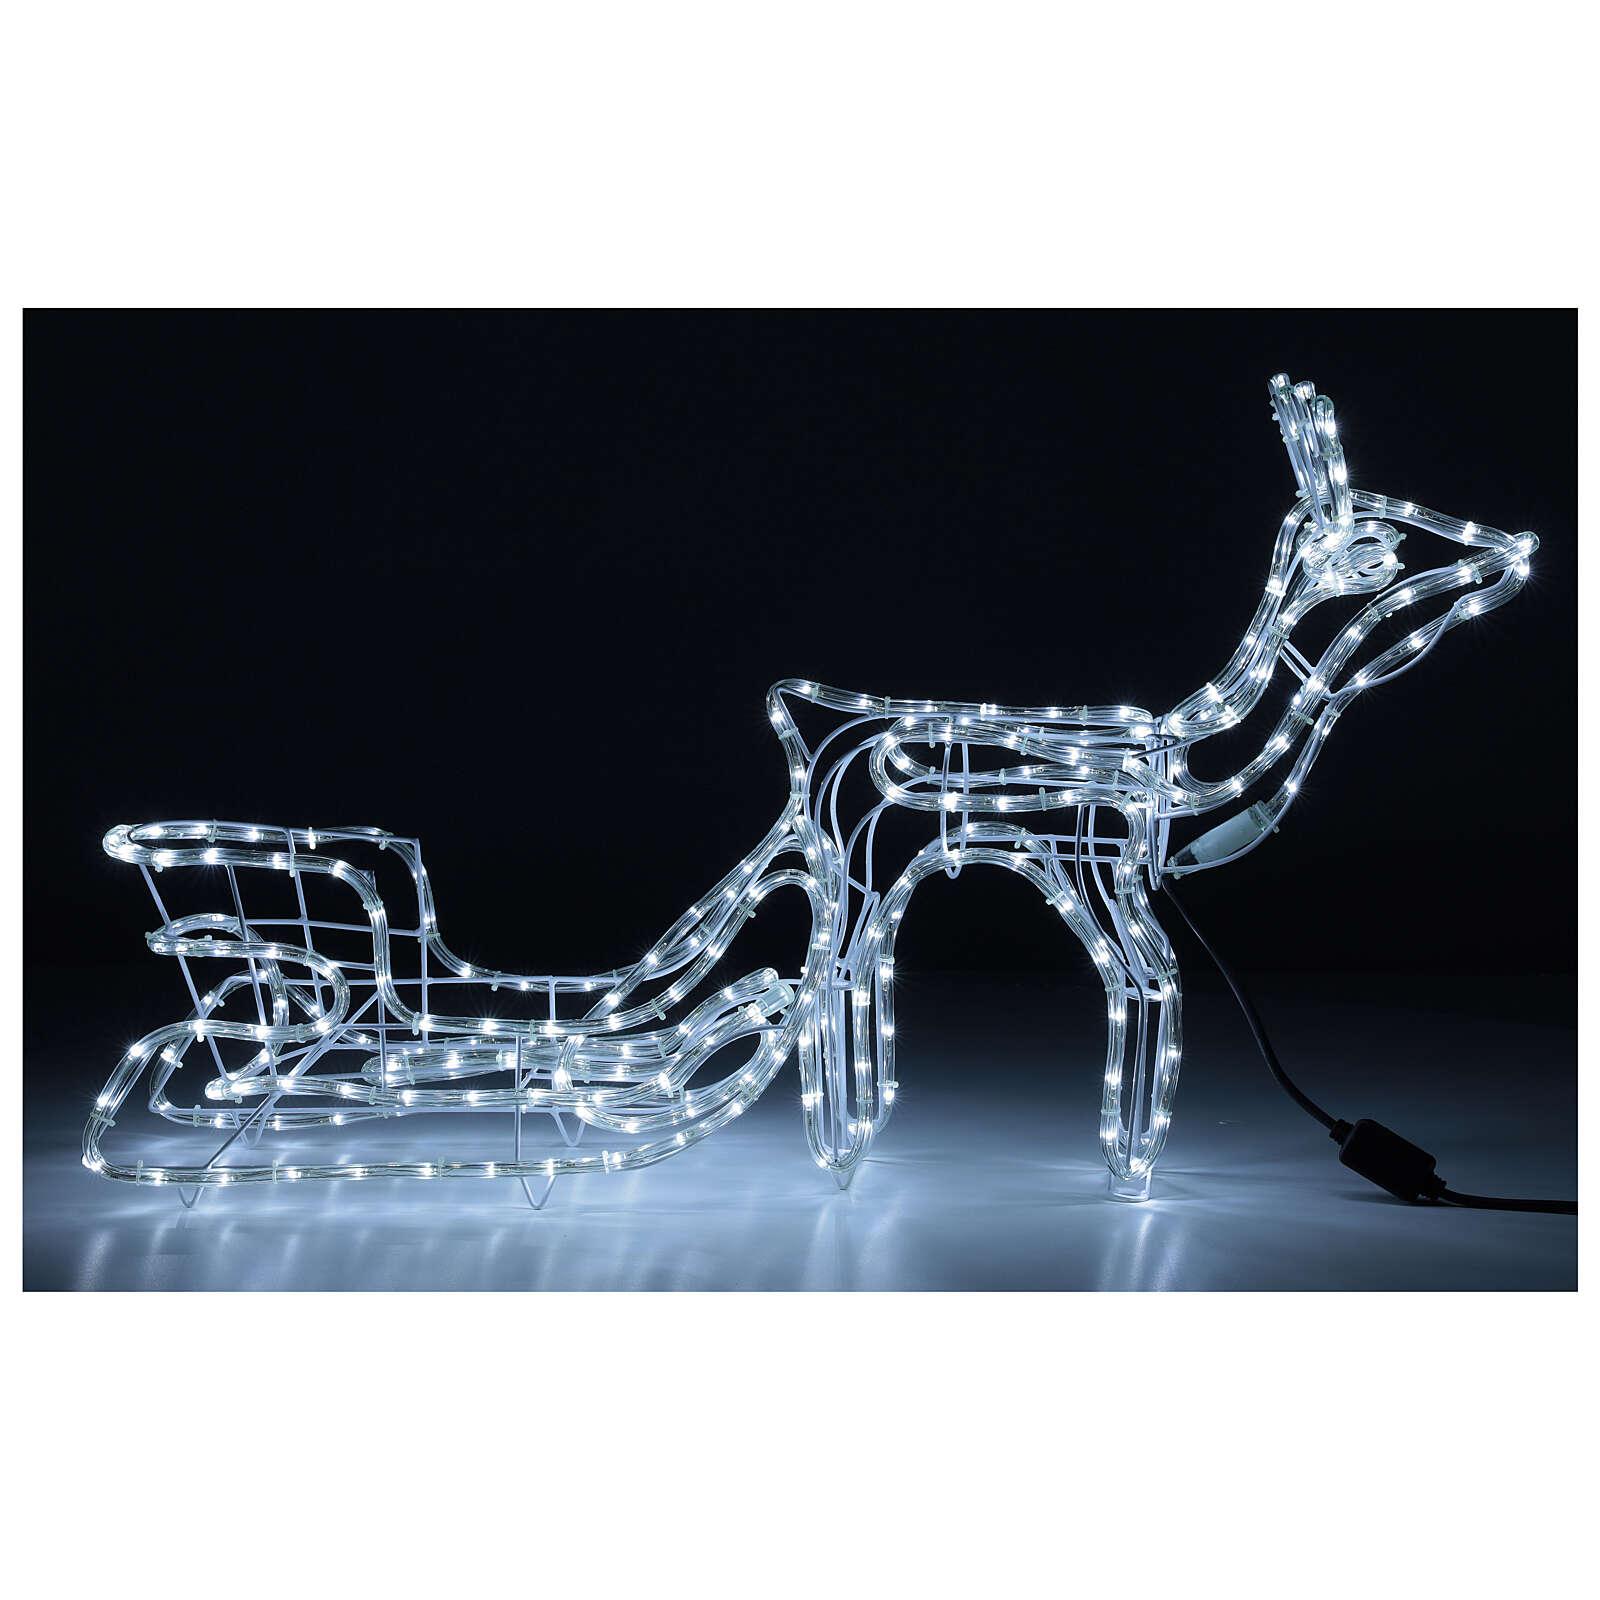 Renna slitta natalizia 264 led bianco freddo h 52 cm corrente ESTERNO 3